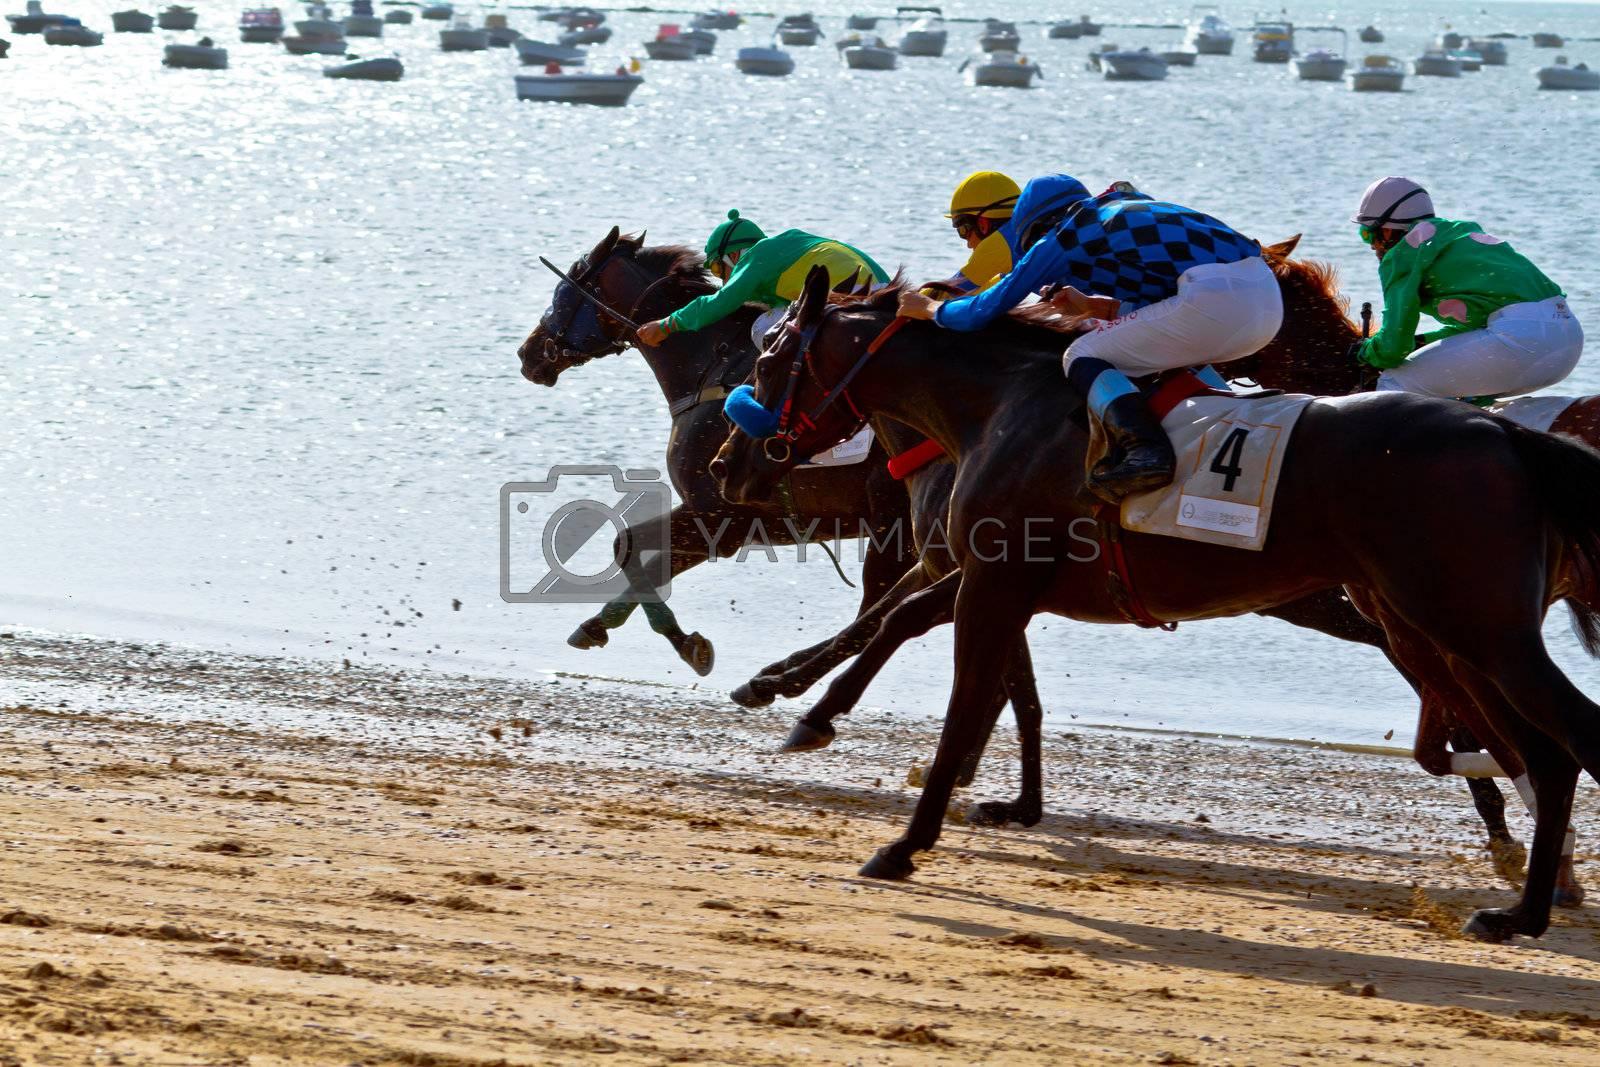 SANLUCAR DE BARRAMEDA, CADIZ, SPAIN - AUGUST 10: Unidentified riders at the start of race horses on Sanlucar de Barrameda beach on August 10, 2011 in Sanlucar de Barrameda, Cadiz, Spain.